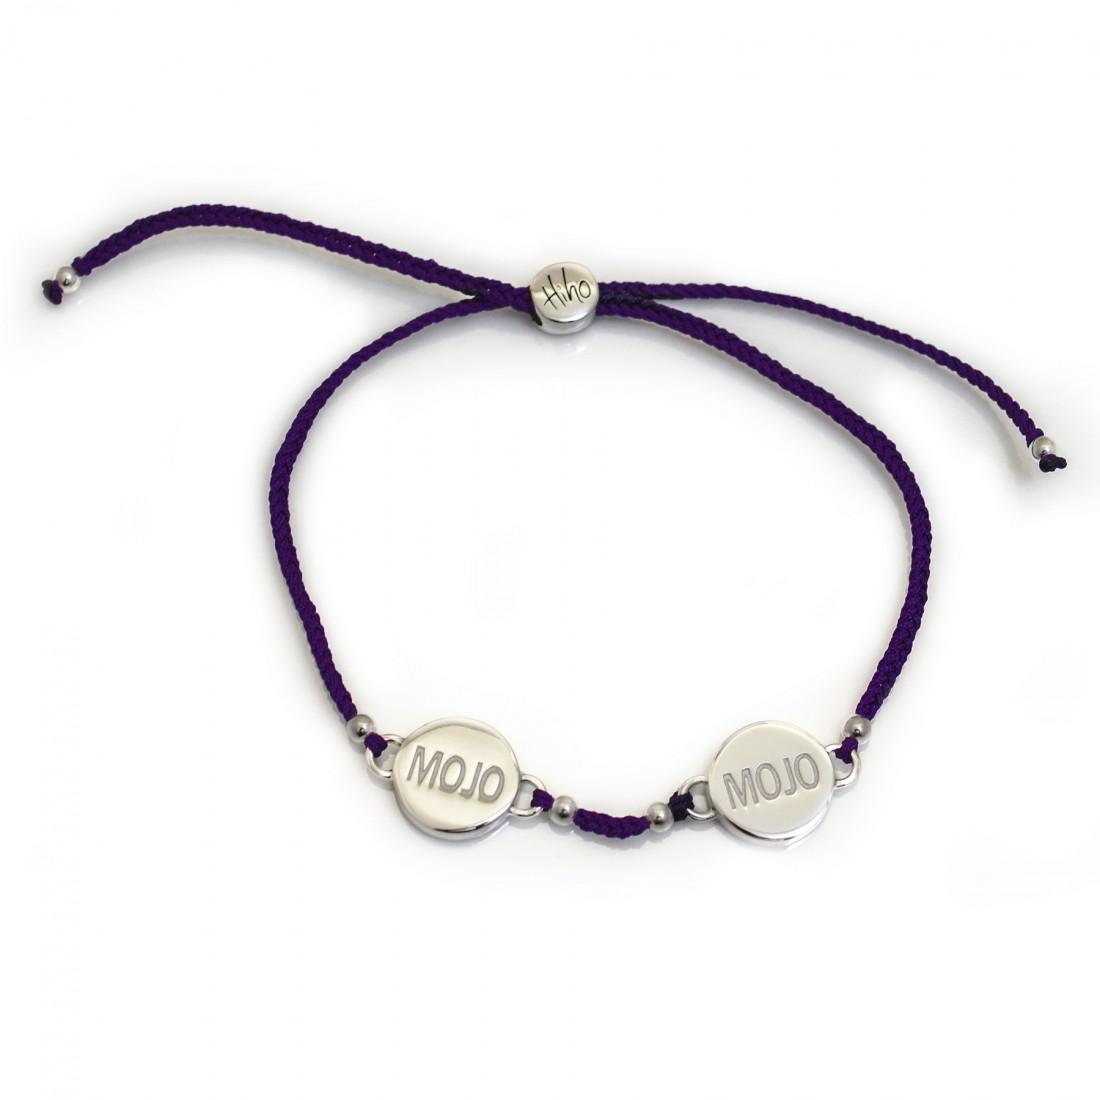 Exclusive Sterling Silver Double Mojo Friendship Bracelet